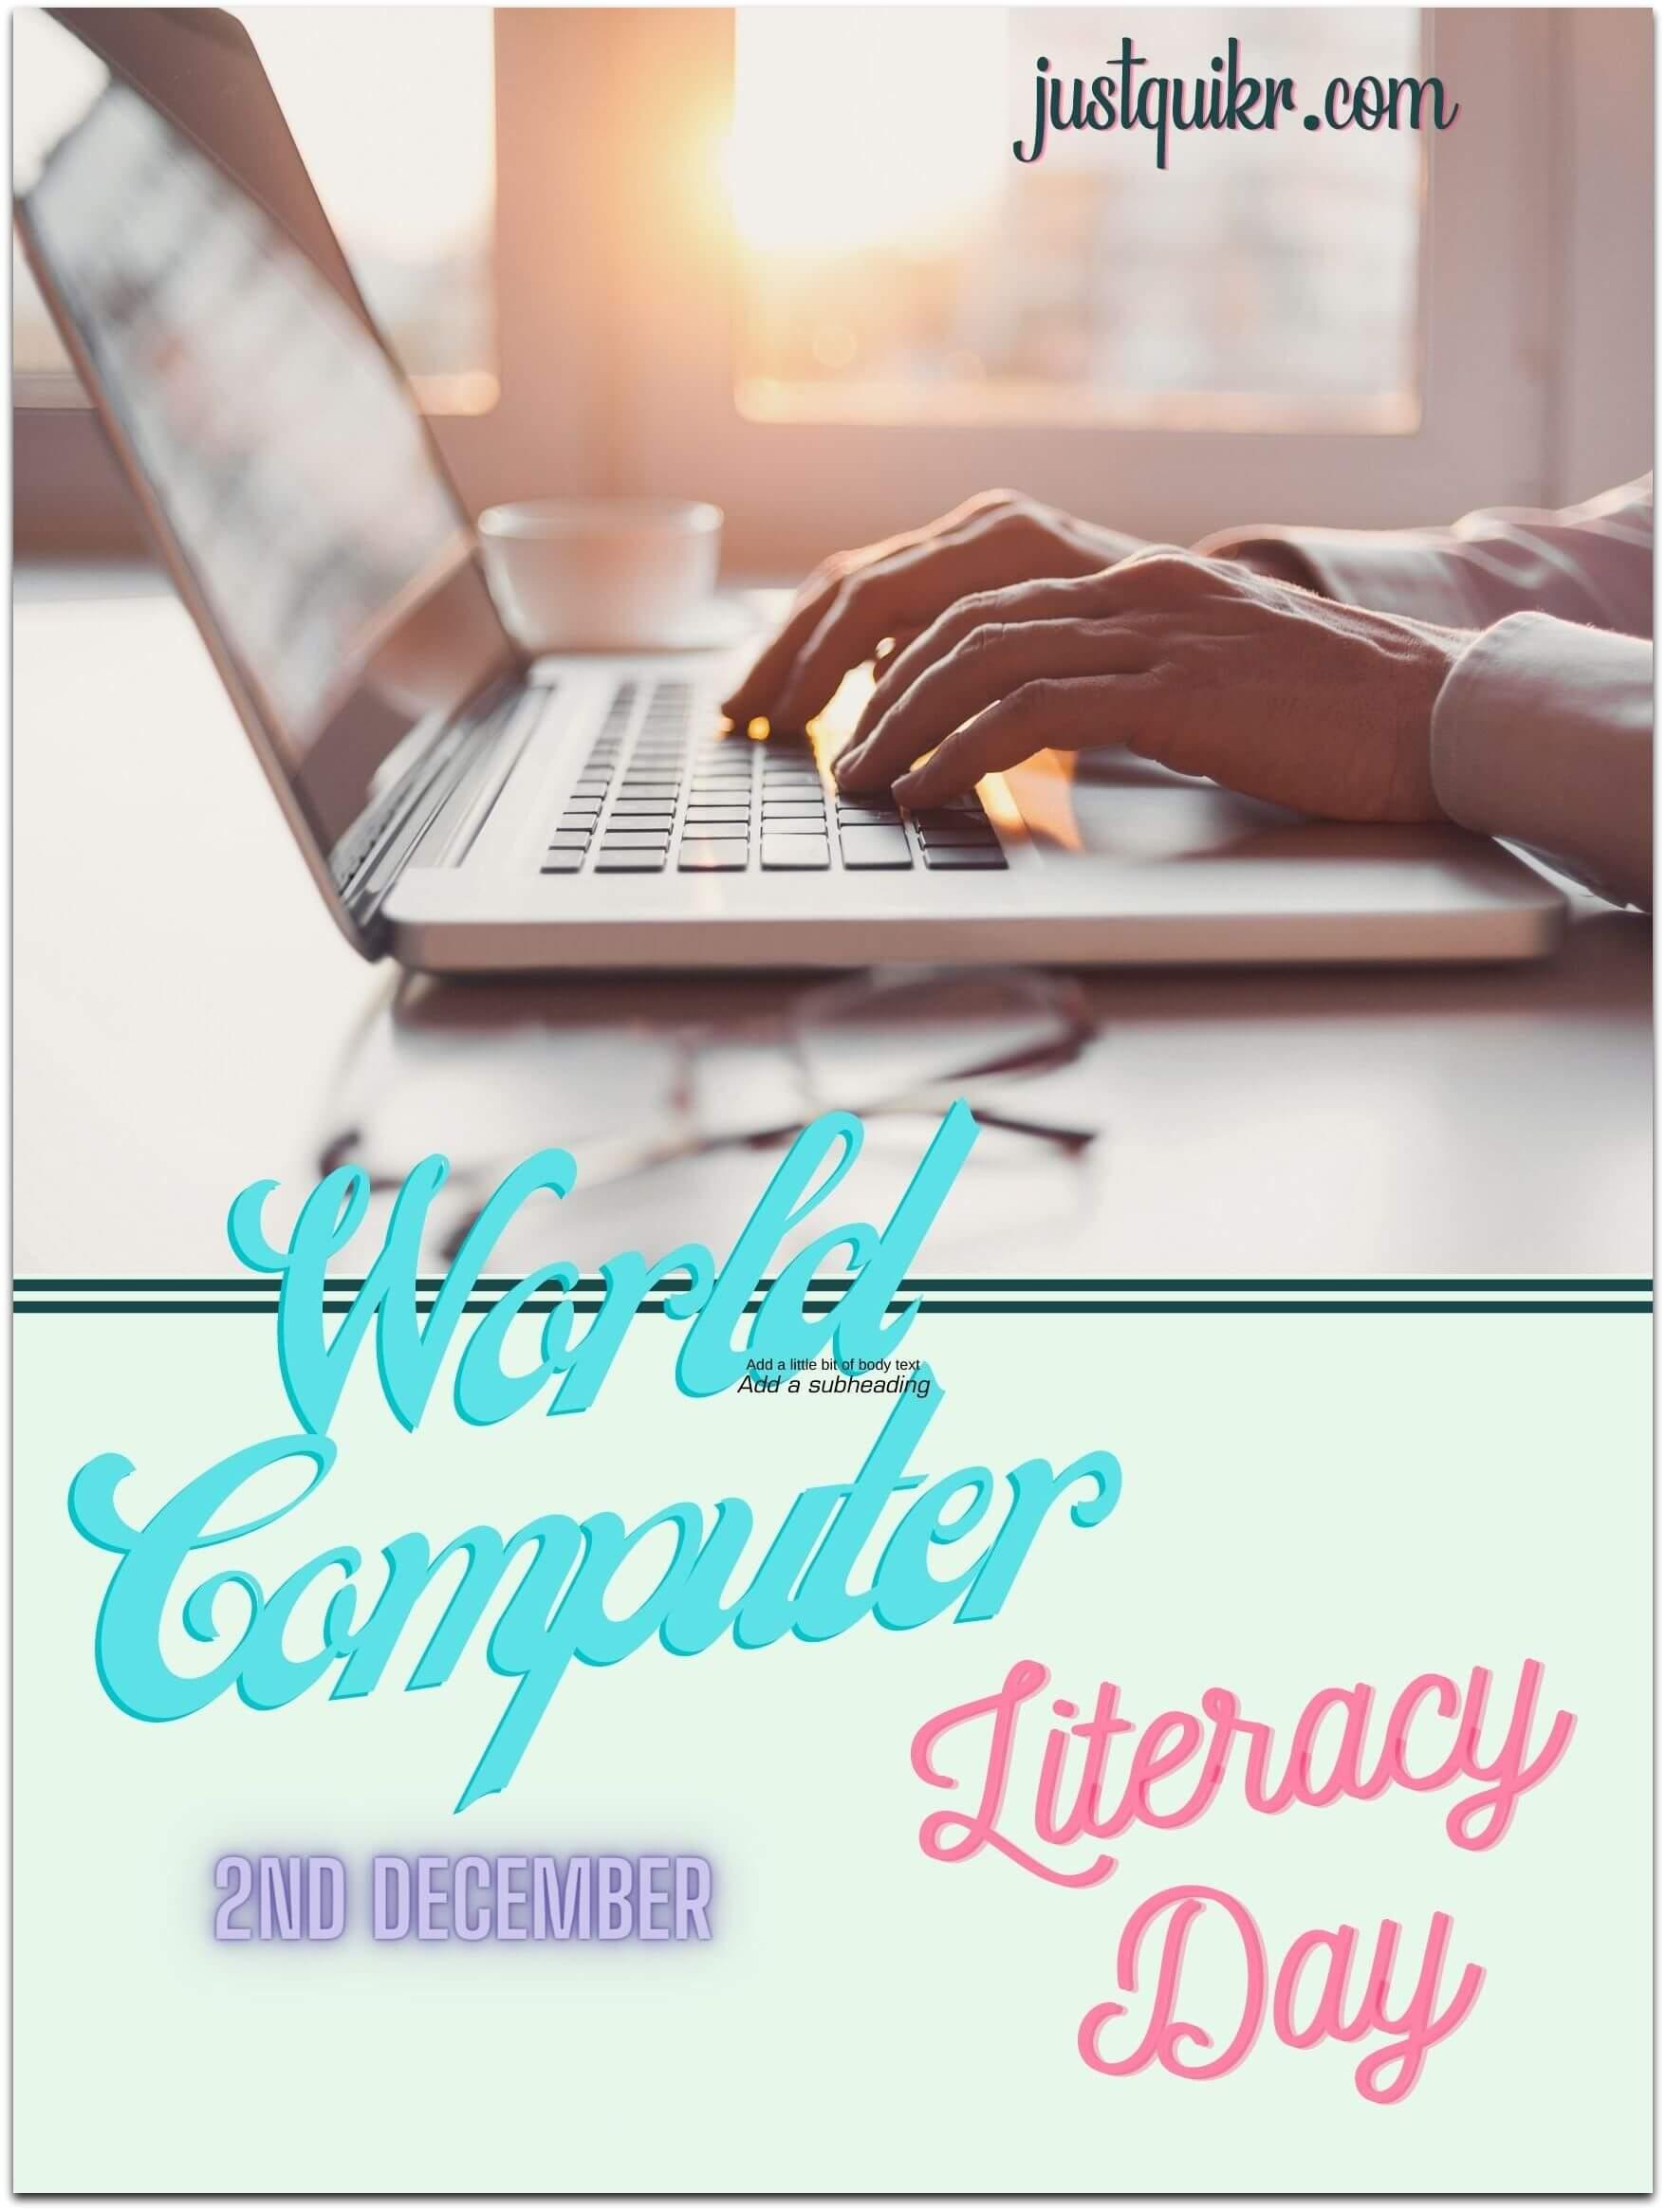 World Computer Literacy Day History Importance and Celebration Ideas